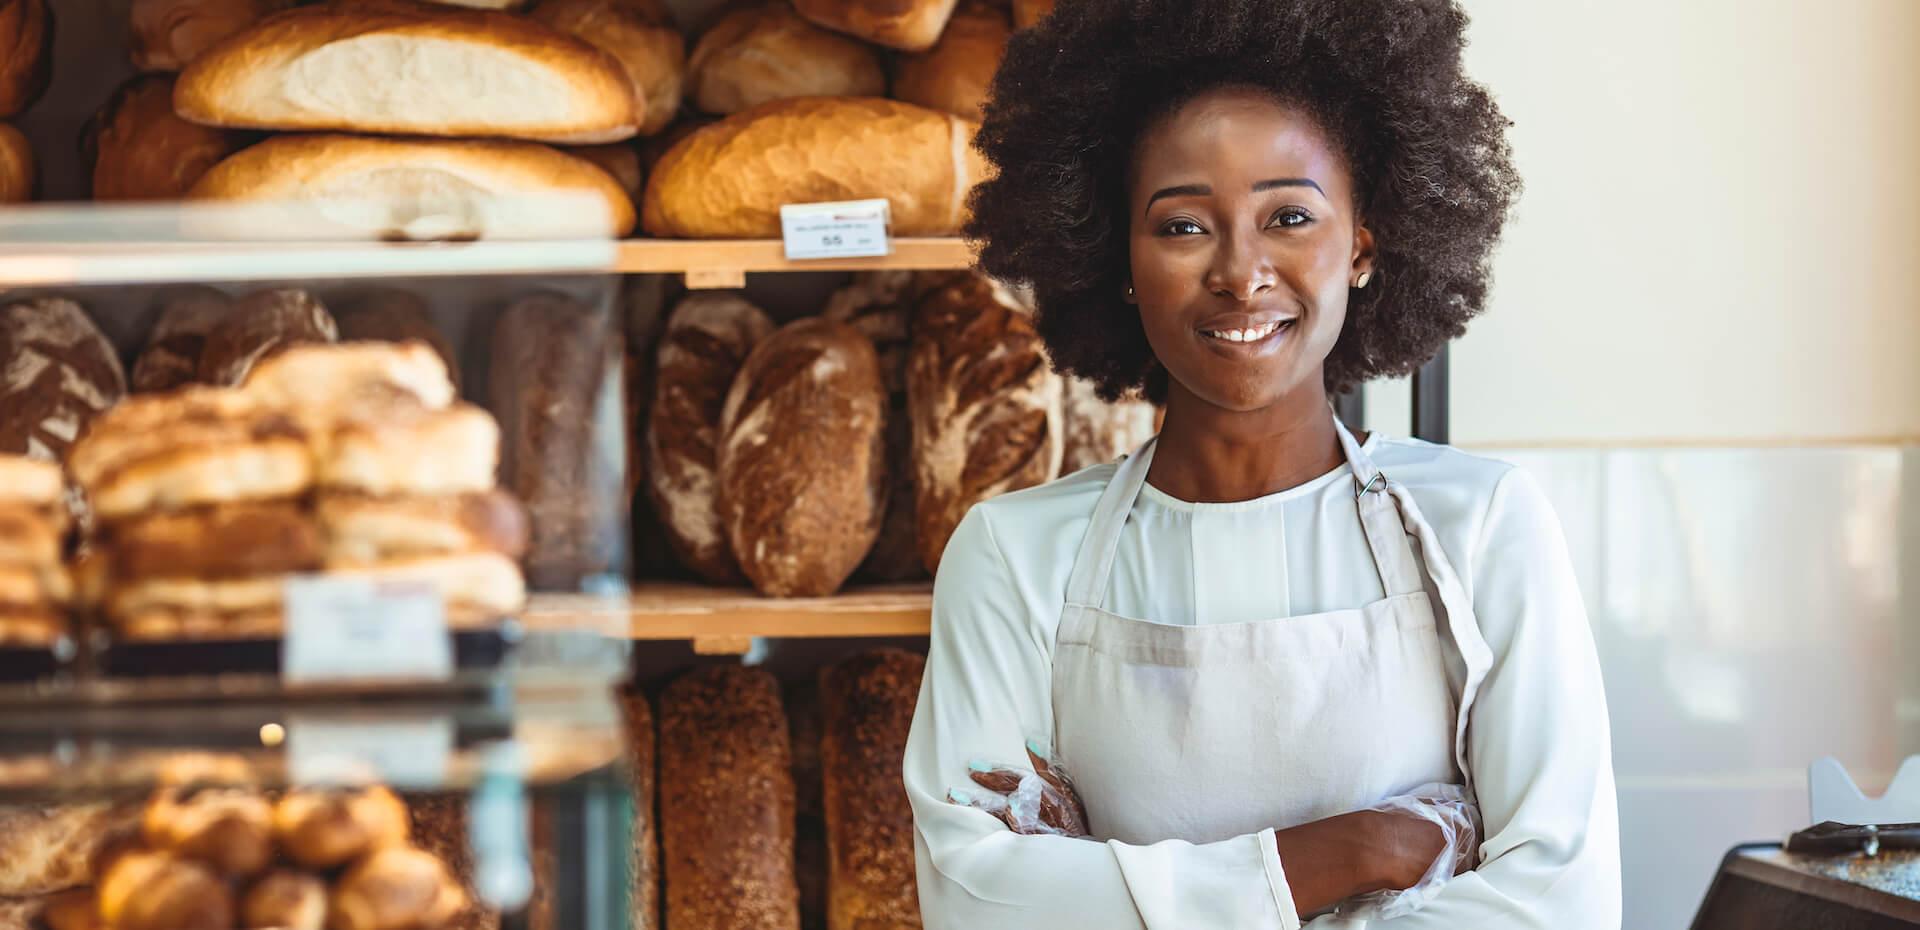 Confident African American baker posing in her bakery